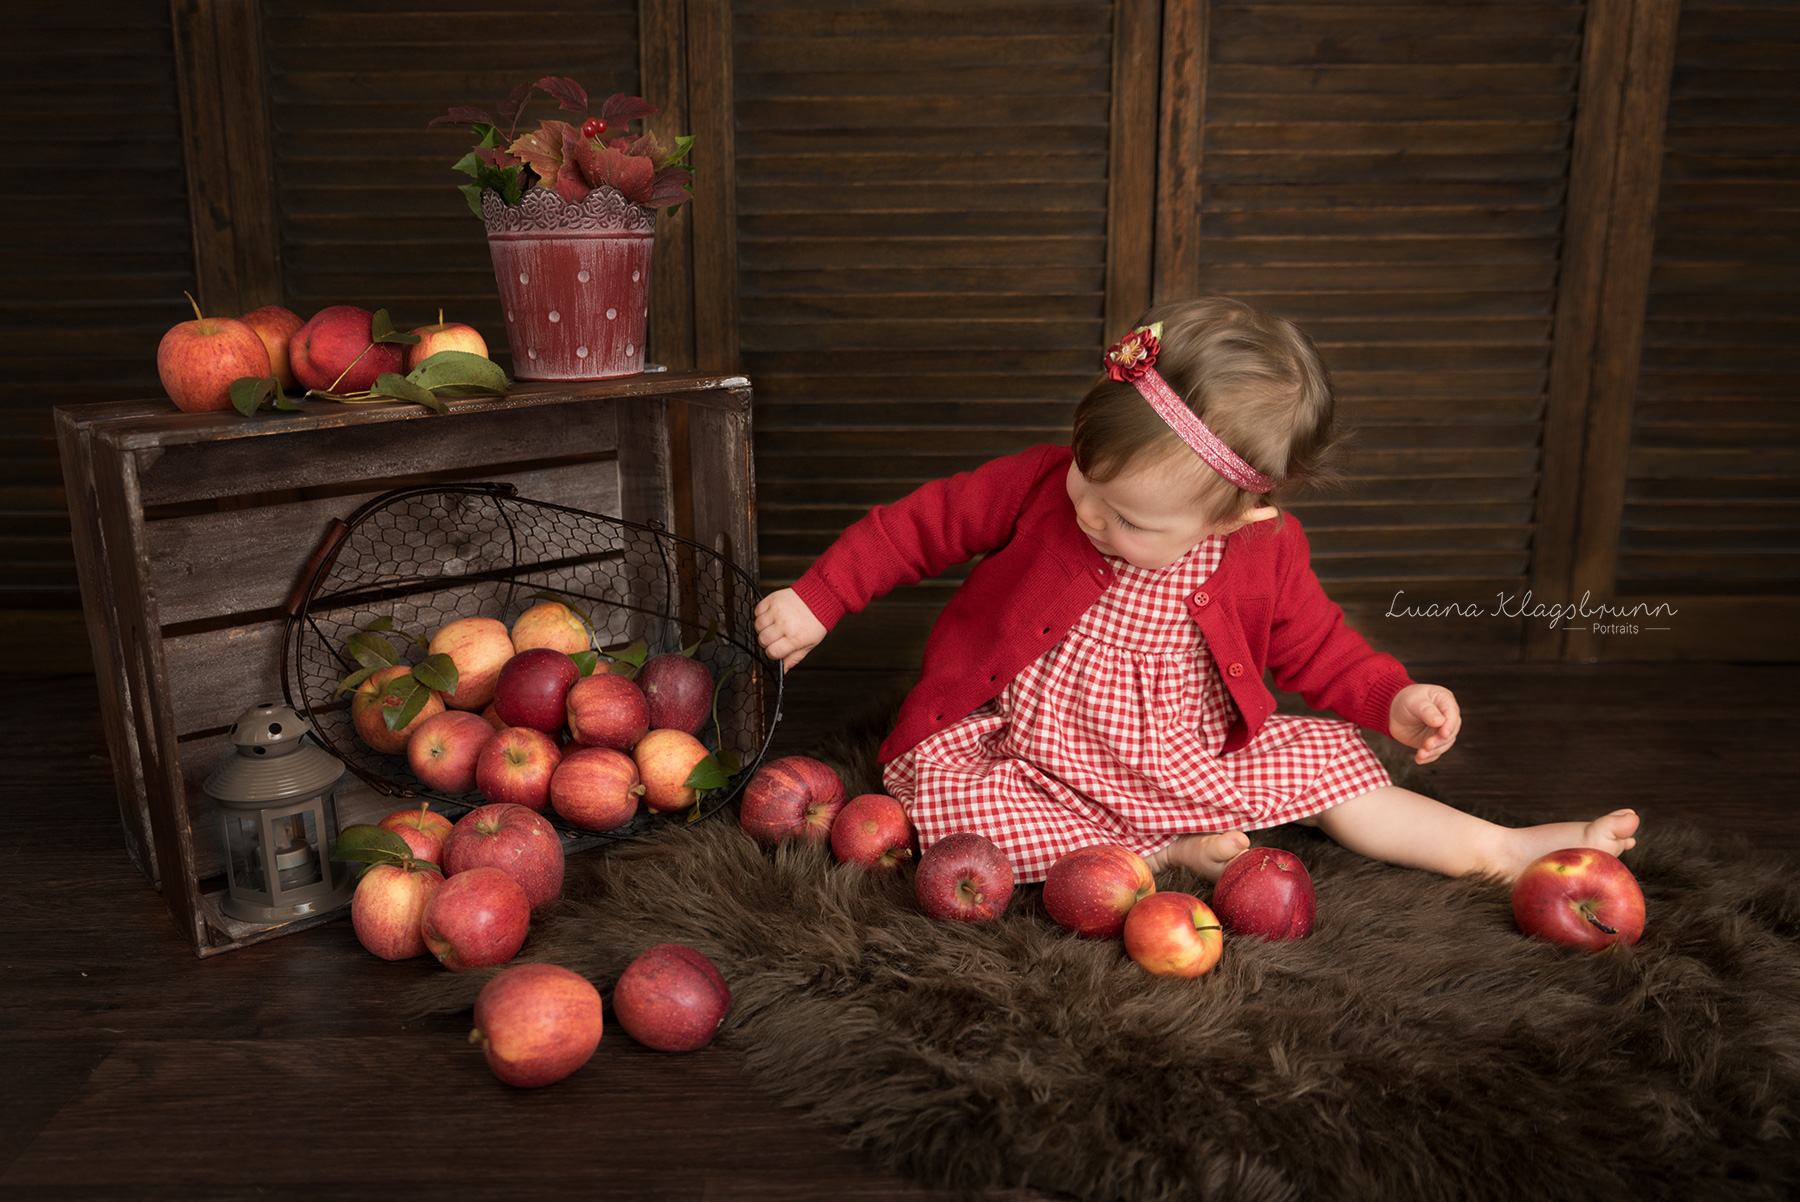 Kinderfotograf Karlsruhe Luana Klagsbrunn 5.jpg